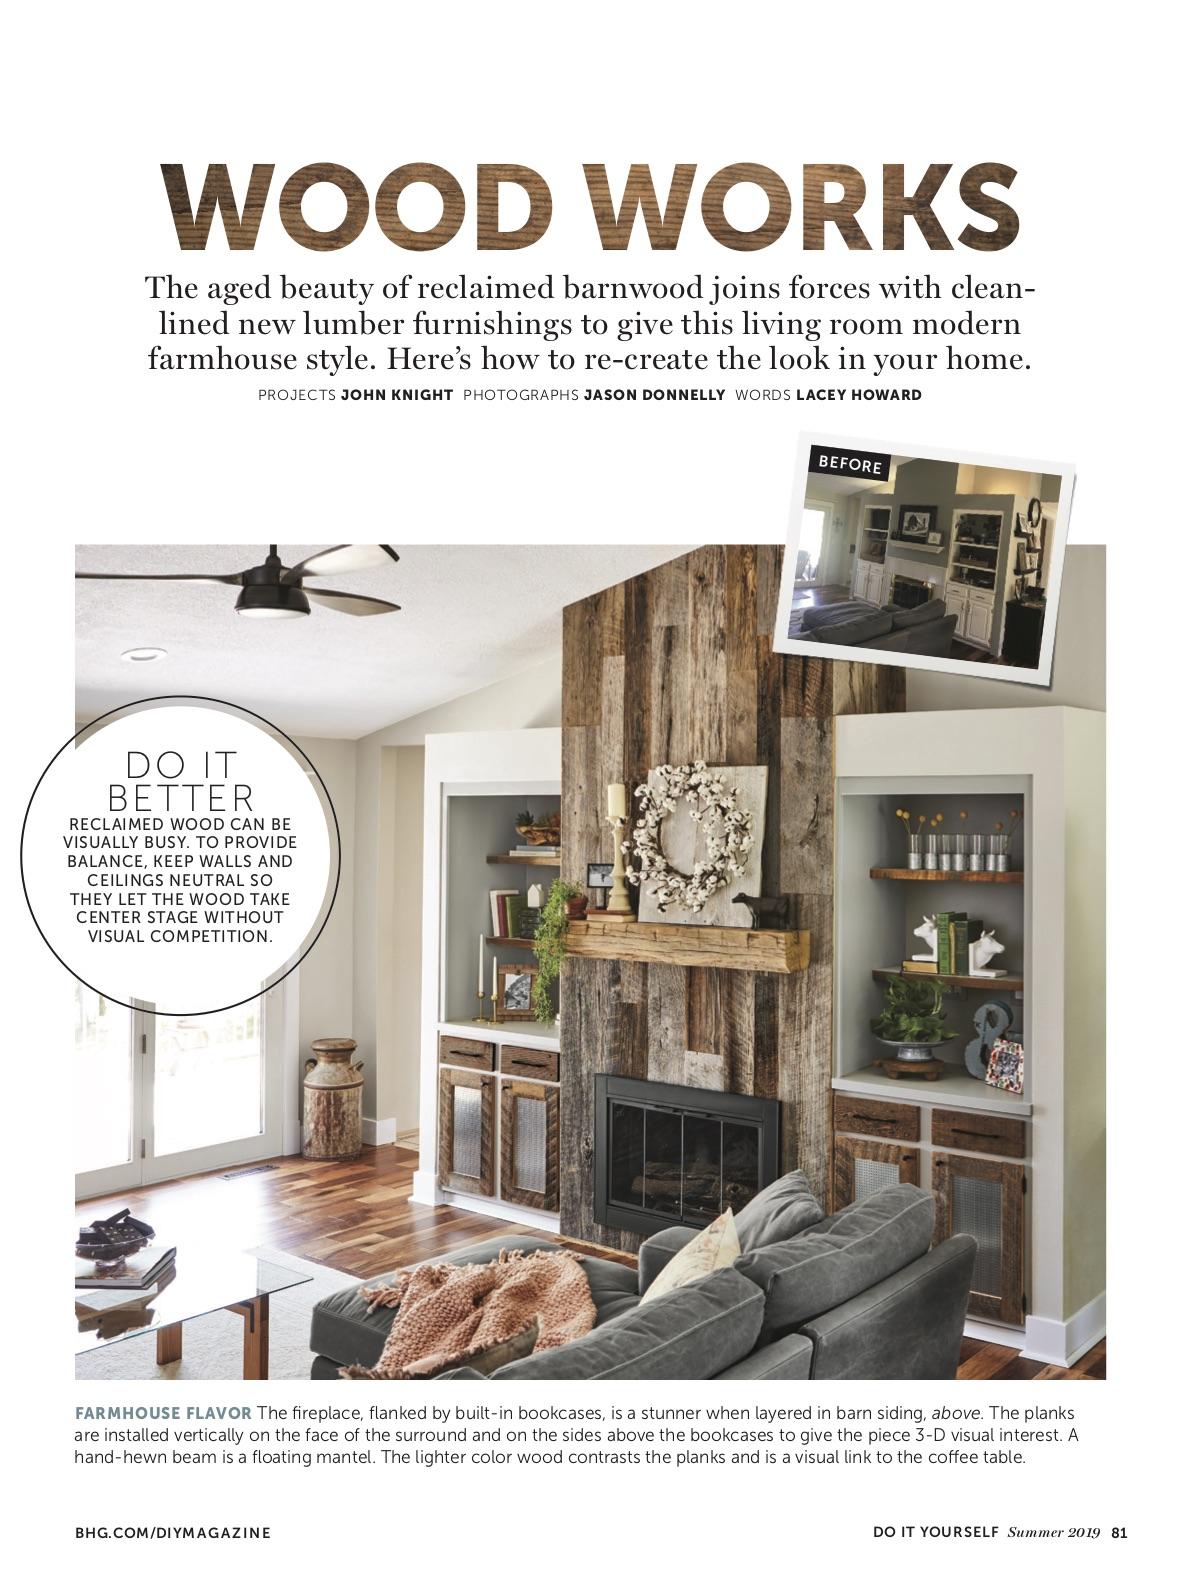 080-087 DIY1619 Mod Farmhouse Schmidt Living Room2.jpg